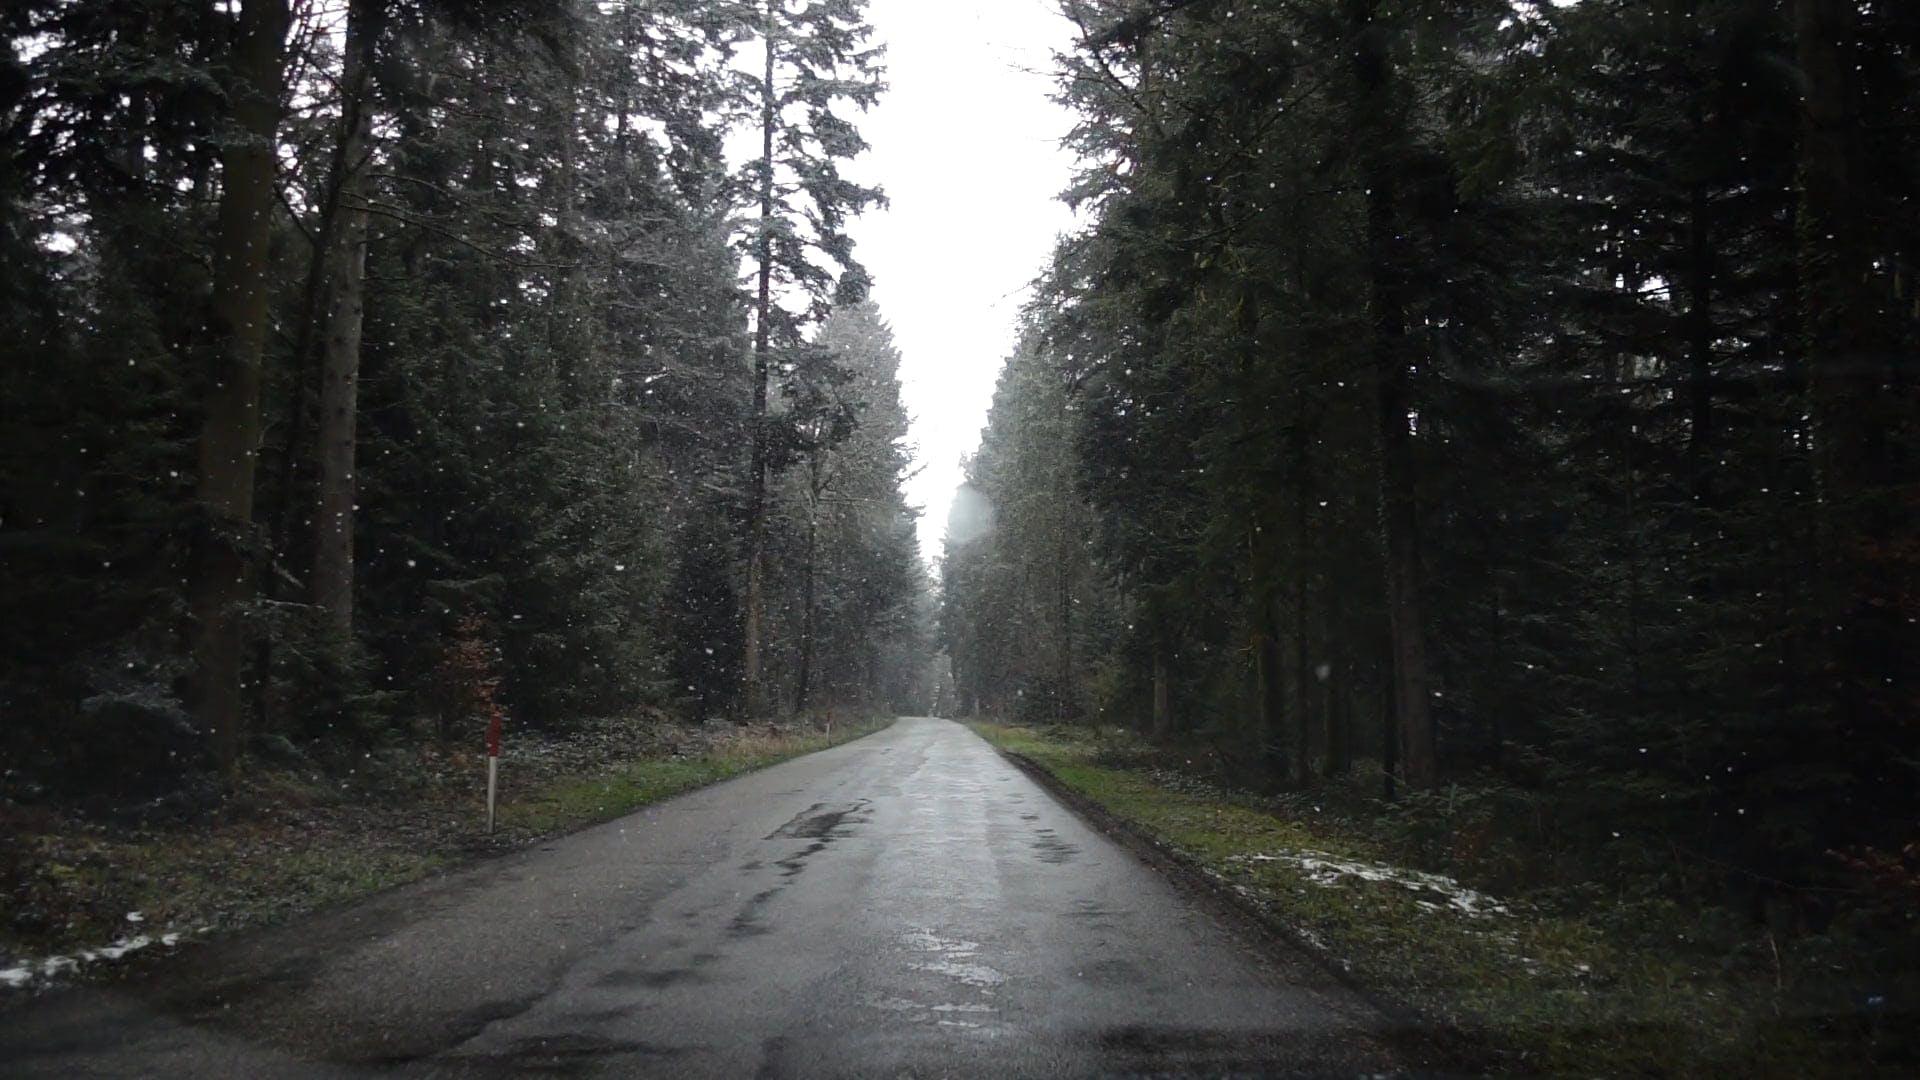 Snow Slowly Falling Down